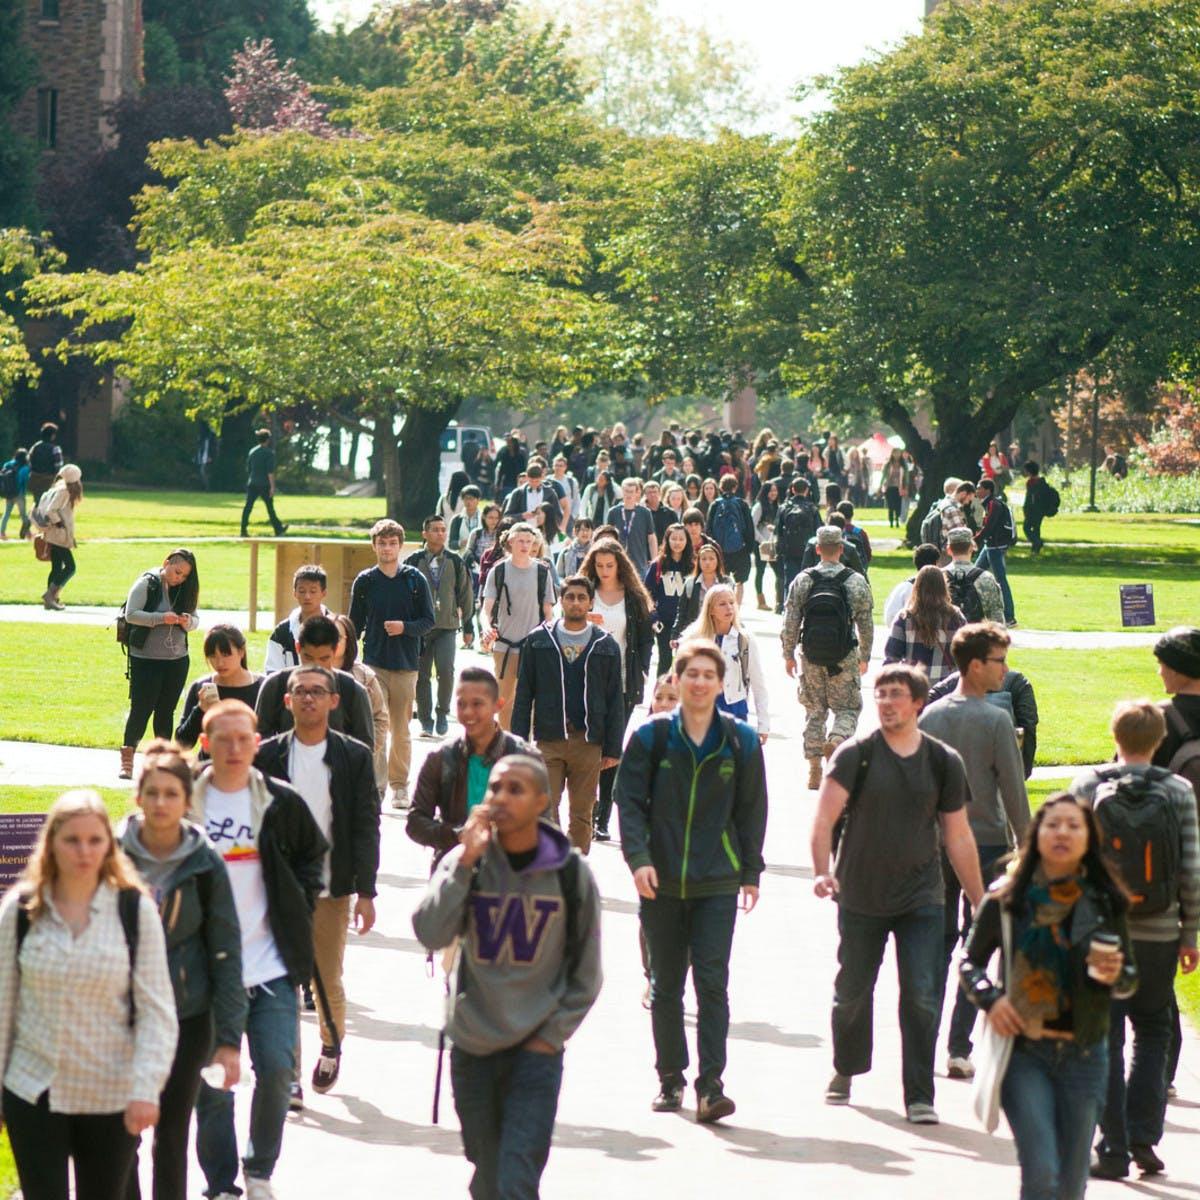 U101: Understanding College and College Life